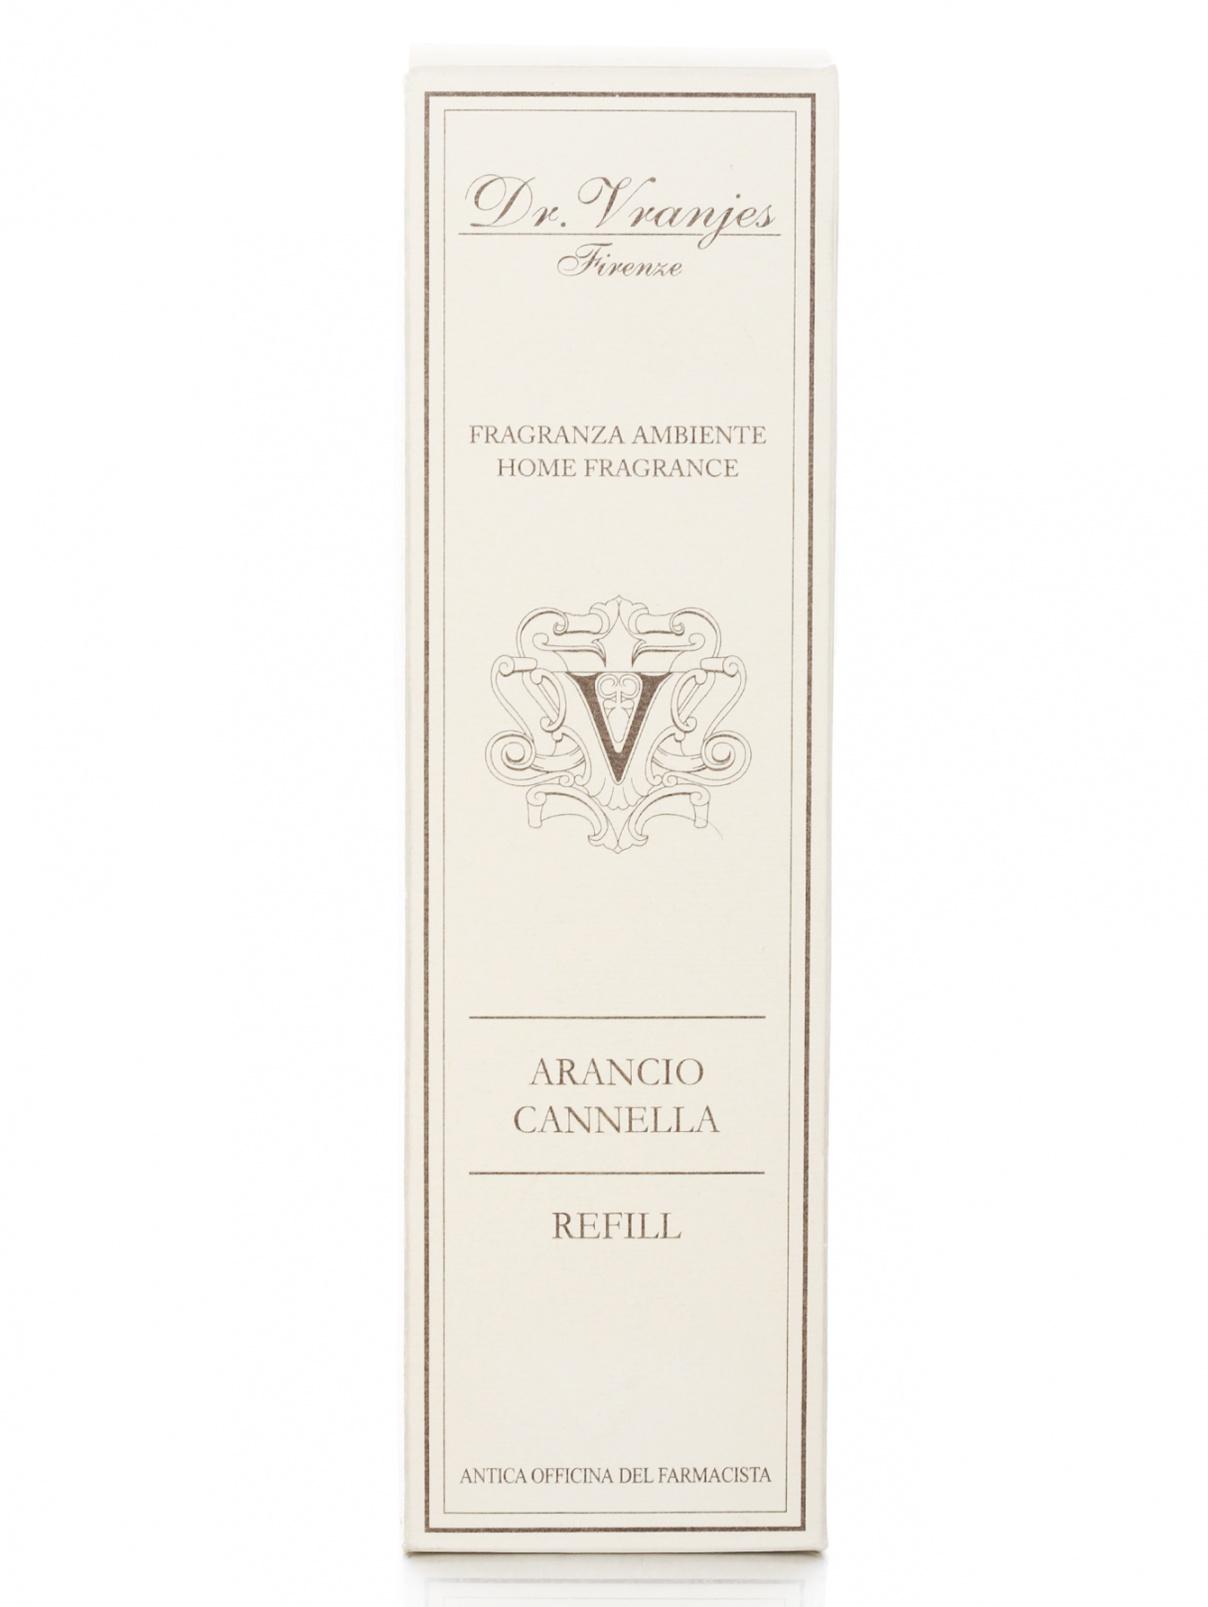 Наполнитель для диффузора Arancio e Cannella - Home Fragrance, 500ml Dr. Vranjes  –  Модель Общий вид